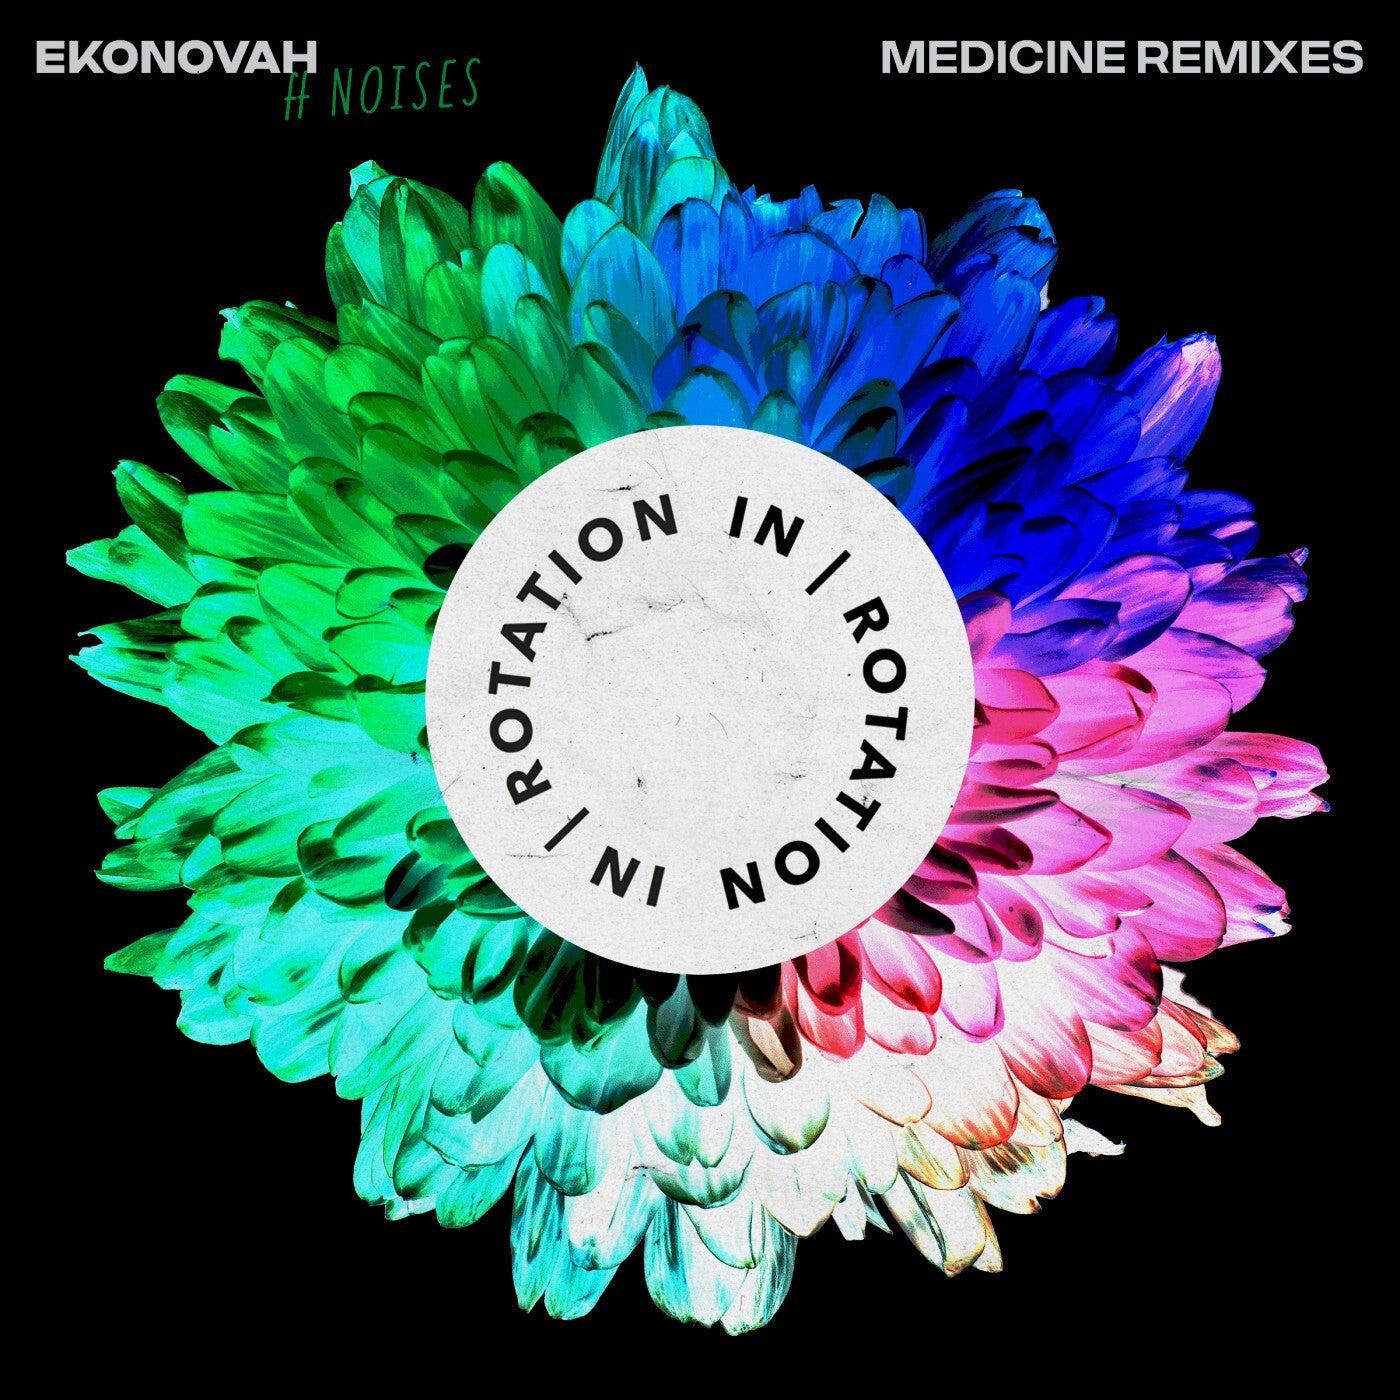 ekonovah-medecine remixes peace maker!